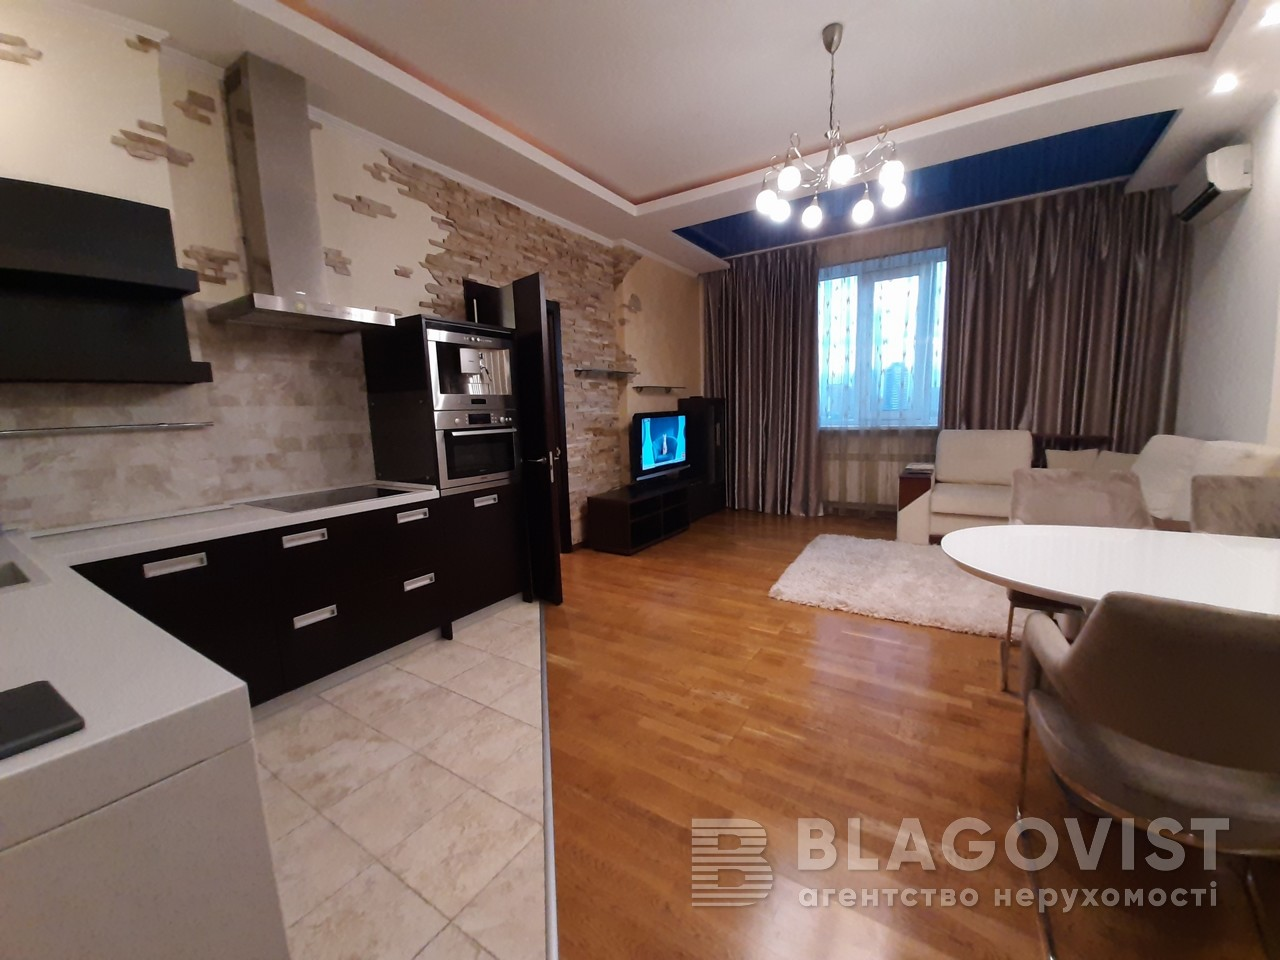 Квартира E-41035, Леси Украинки бульв., 7б, Киев - Фото 14